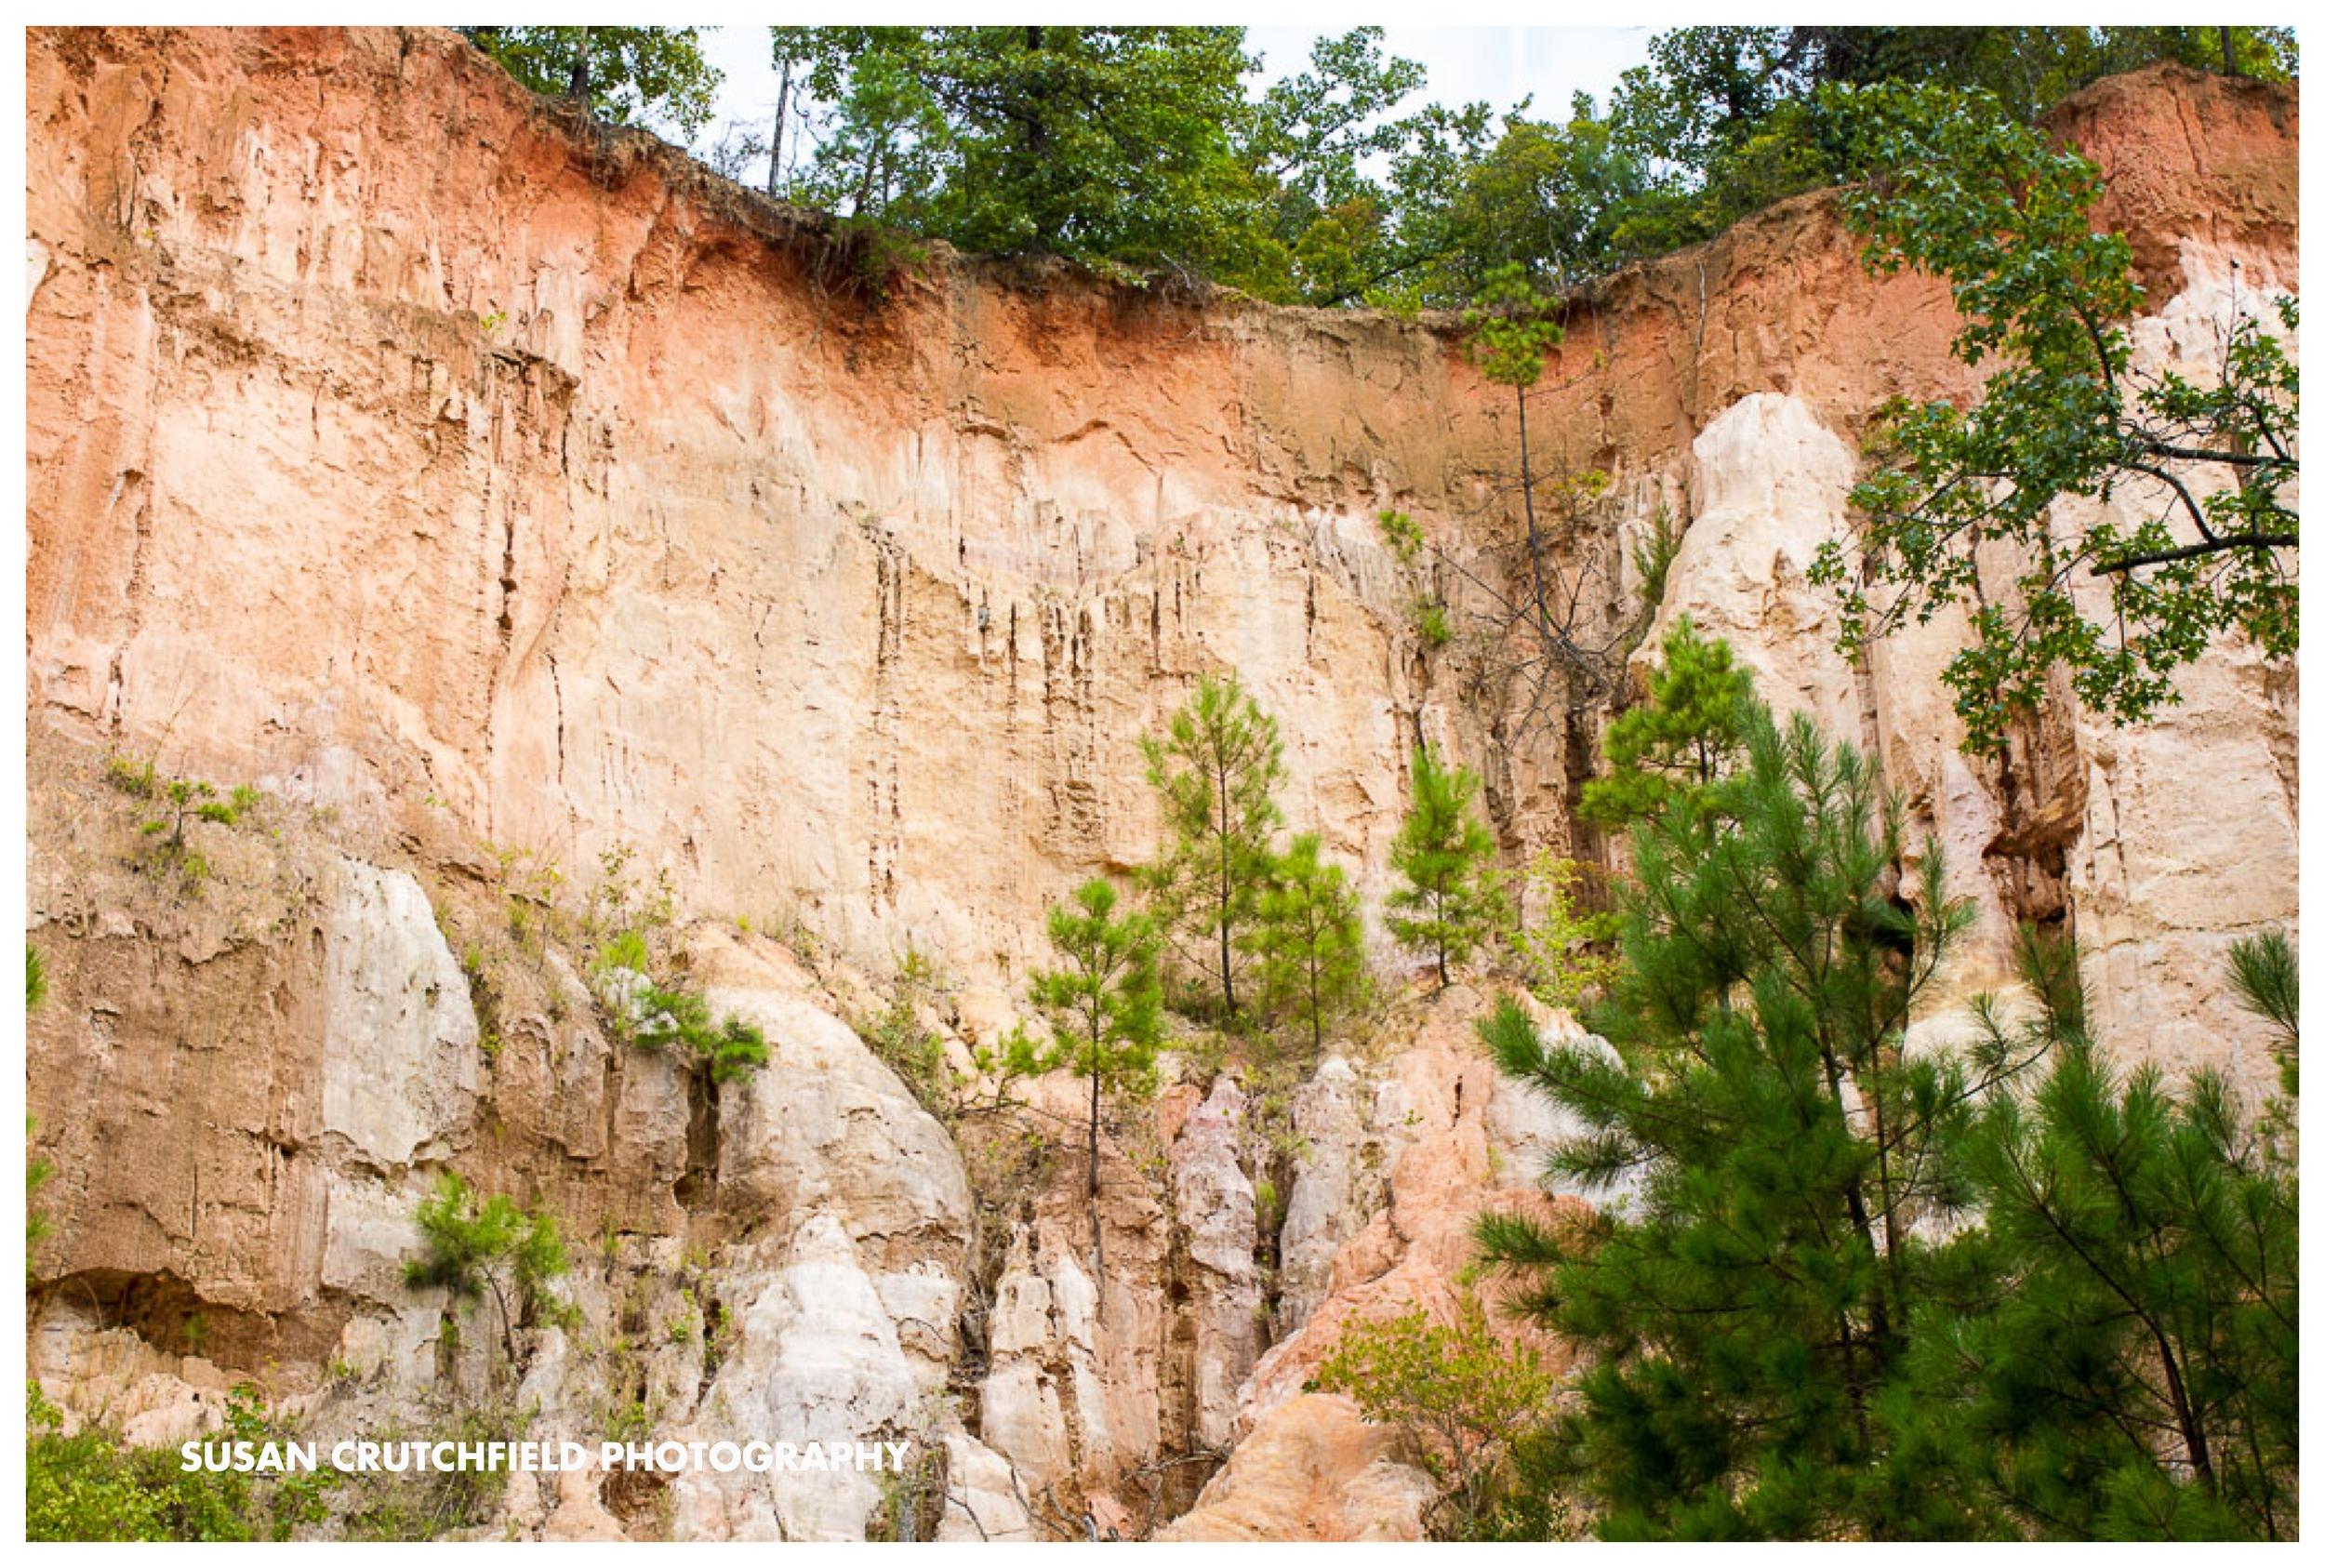 Georgia Geology